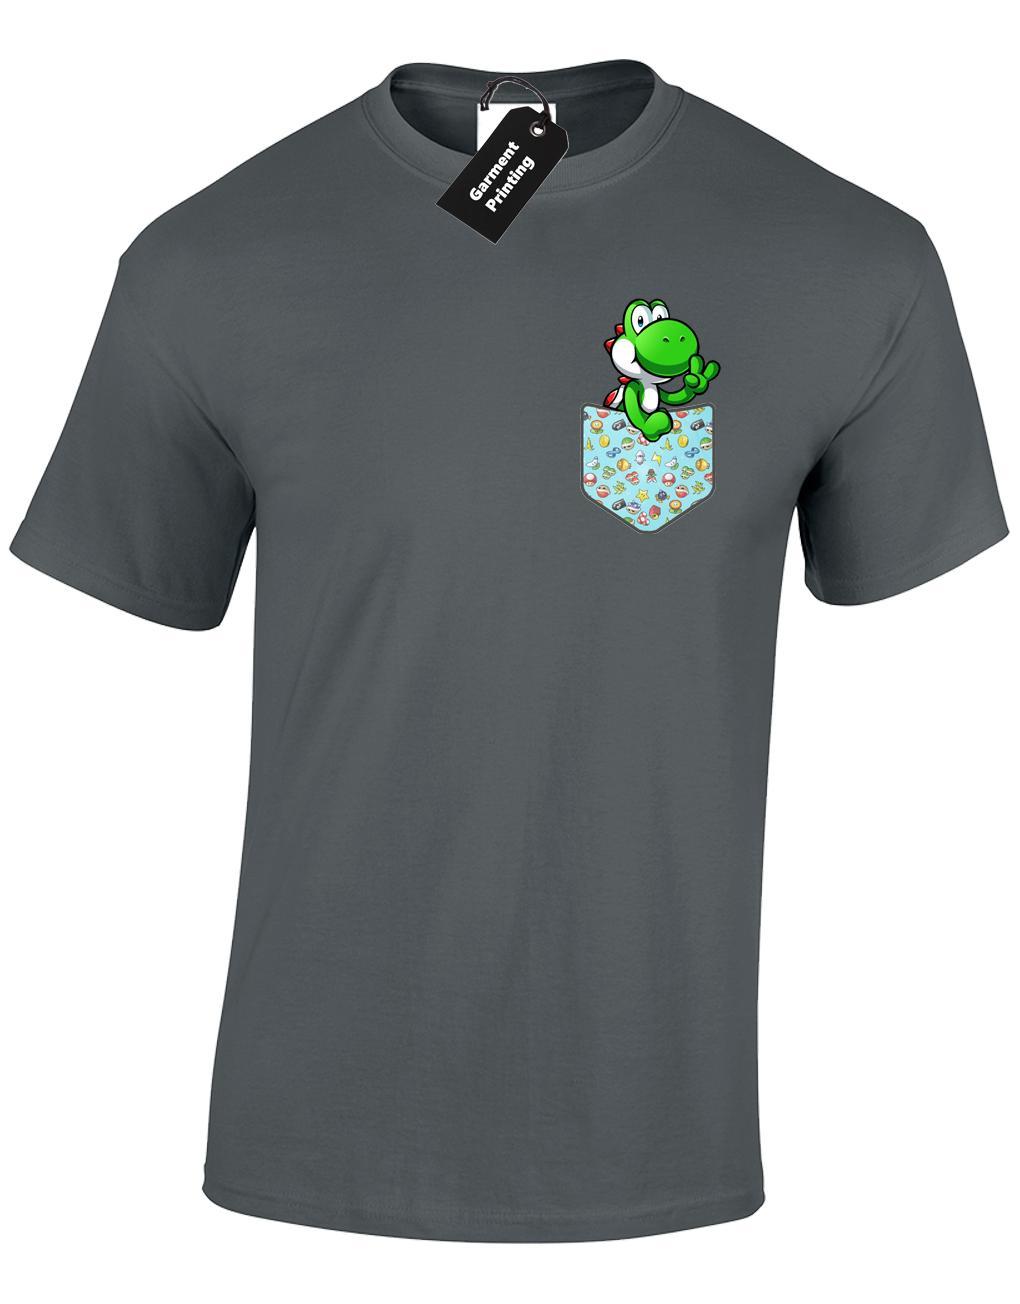 Yoshi Pocket Mens T Shirt Funny Gamer Retro Gaming Design Snes Gift